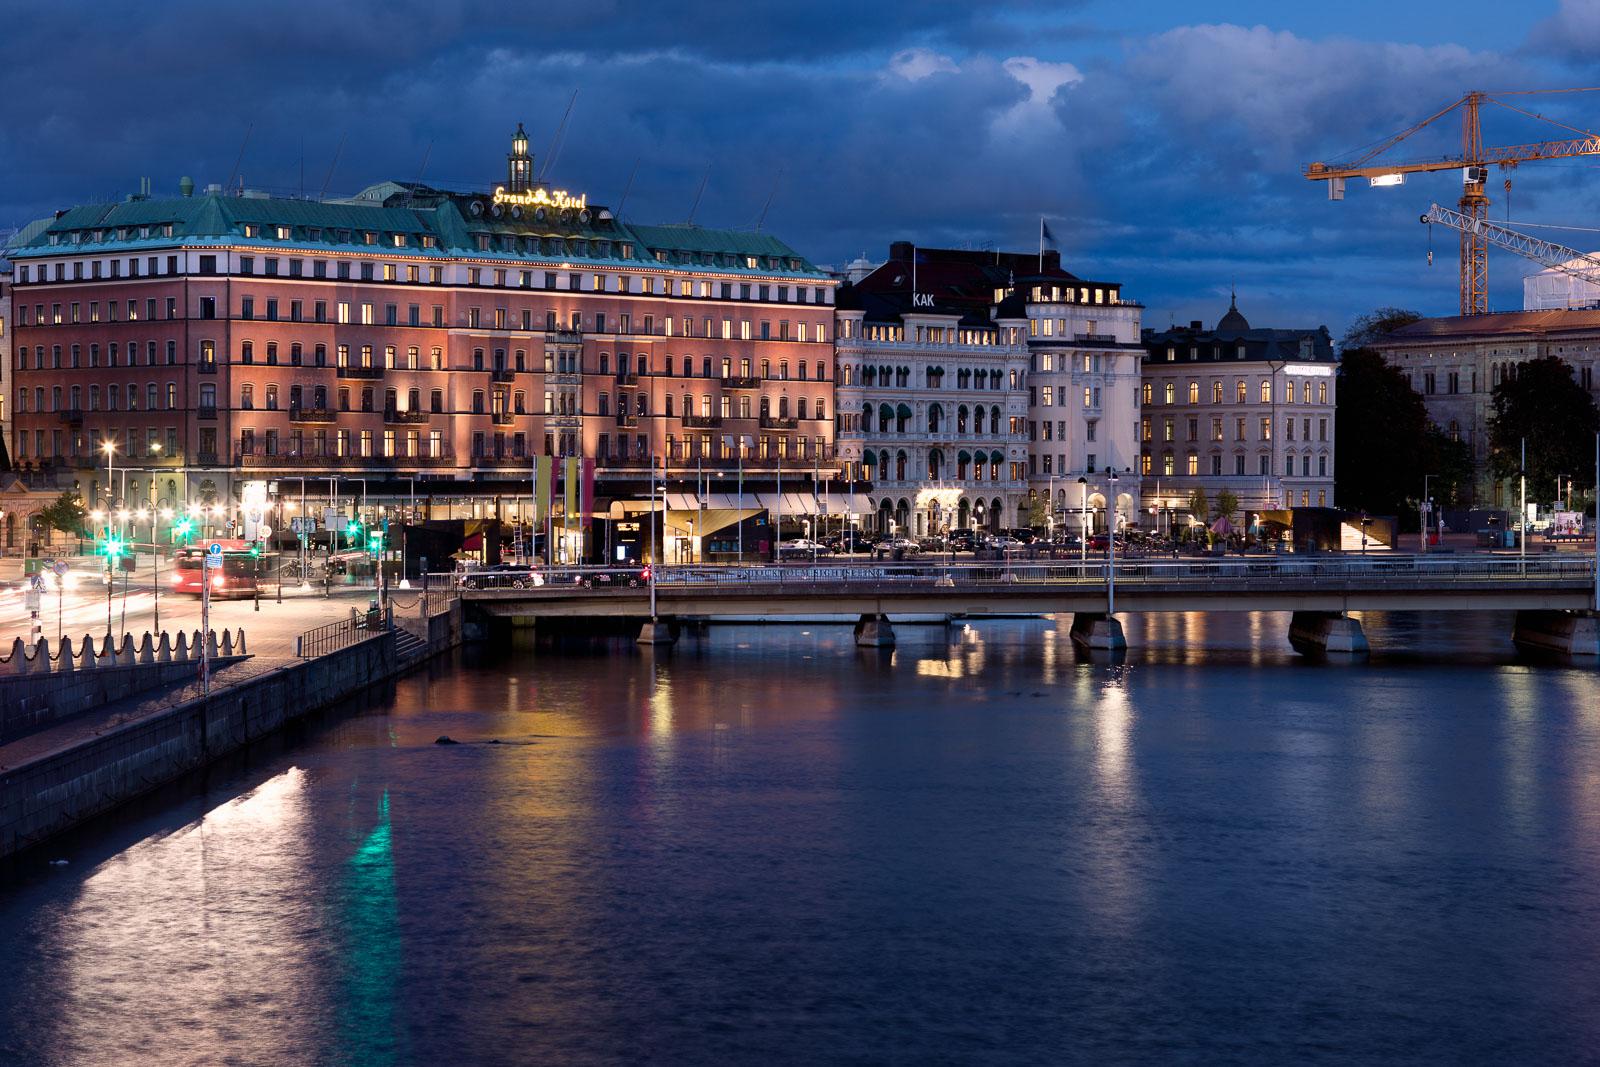 161002-stockholm-464-Edit.jpg